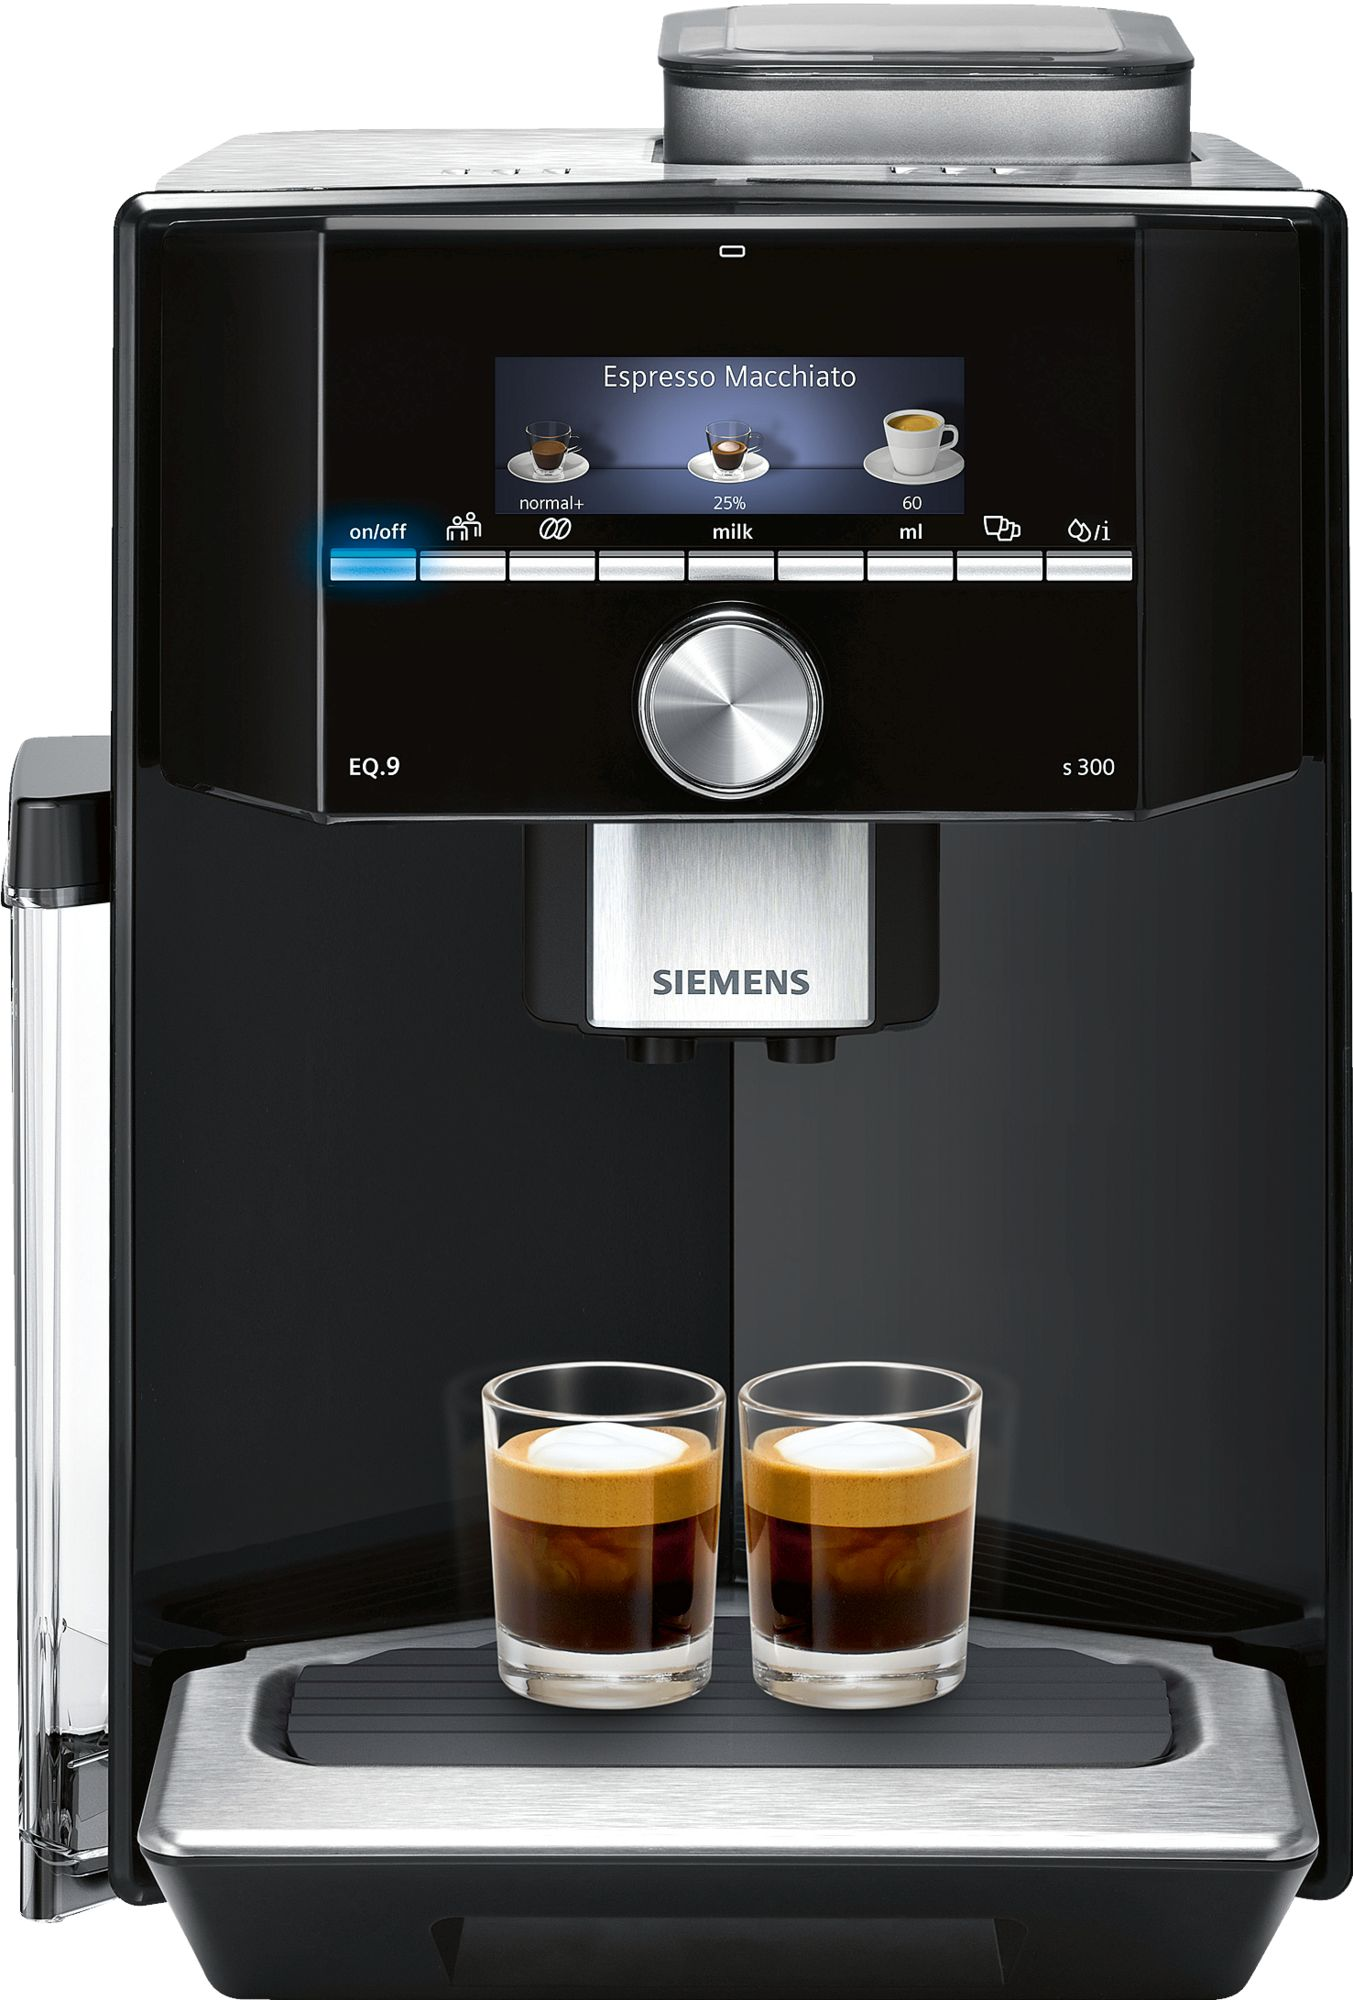 Siemens - Siemens EQ.9 s300 Tam Otomatik Kahve Makinesi